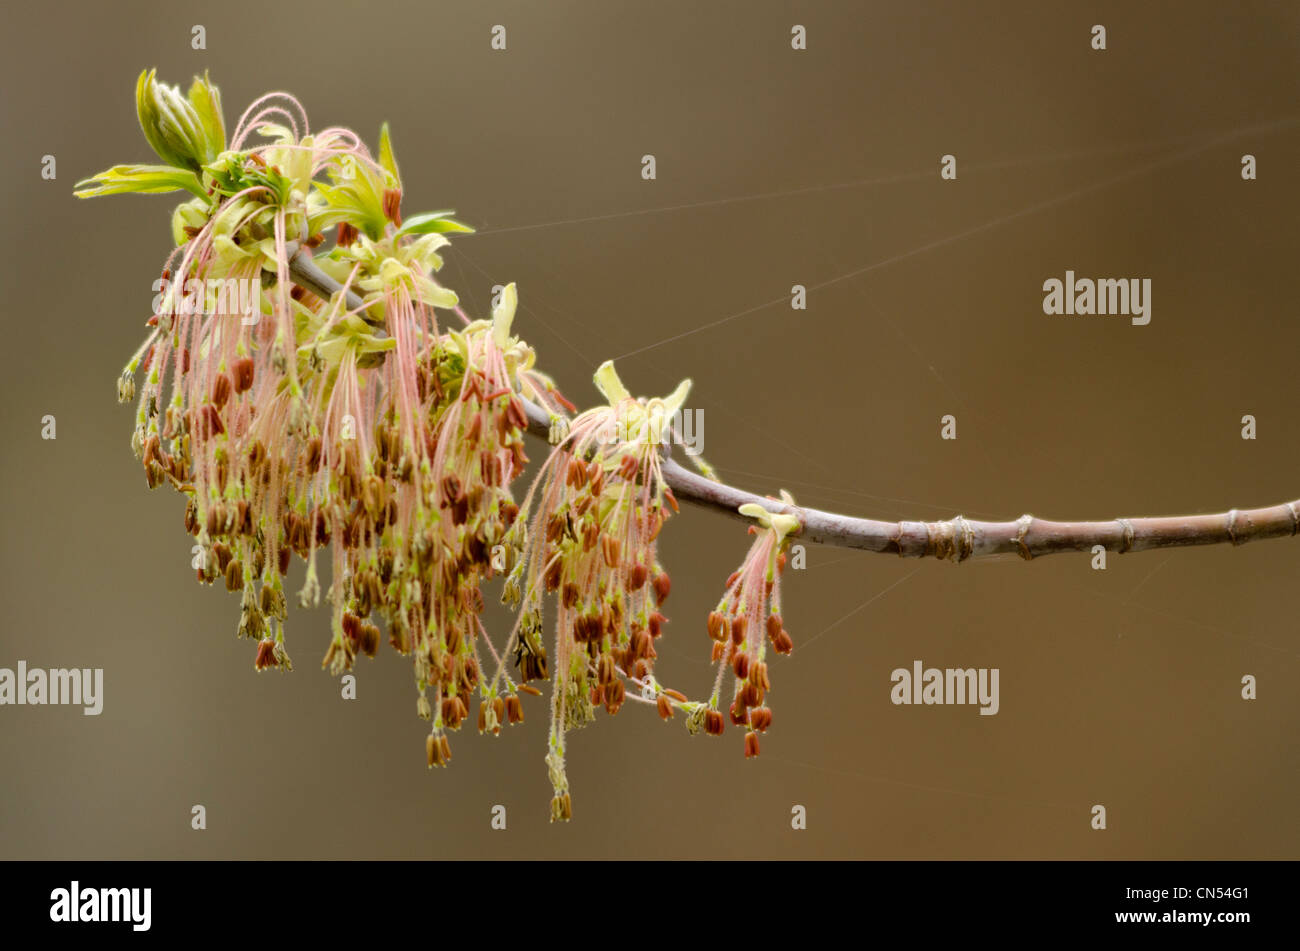 Box elder bloom, Imnaha Canyon, Oregon. - Stock Image